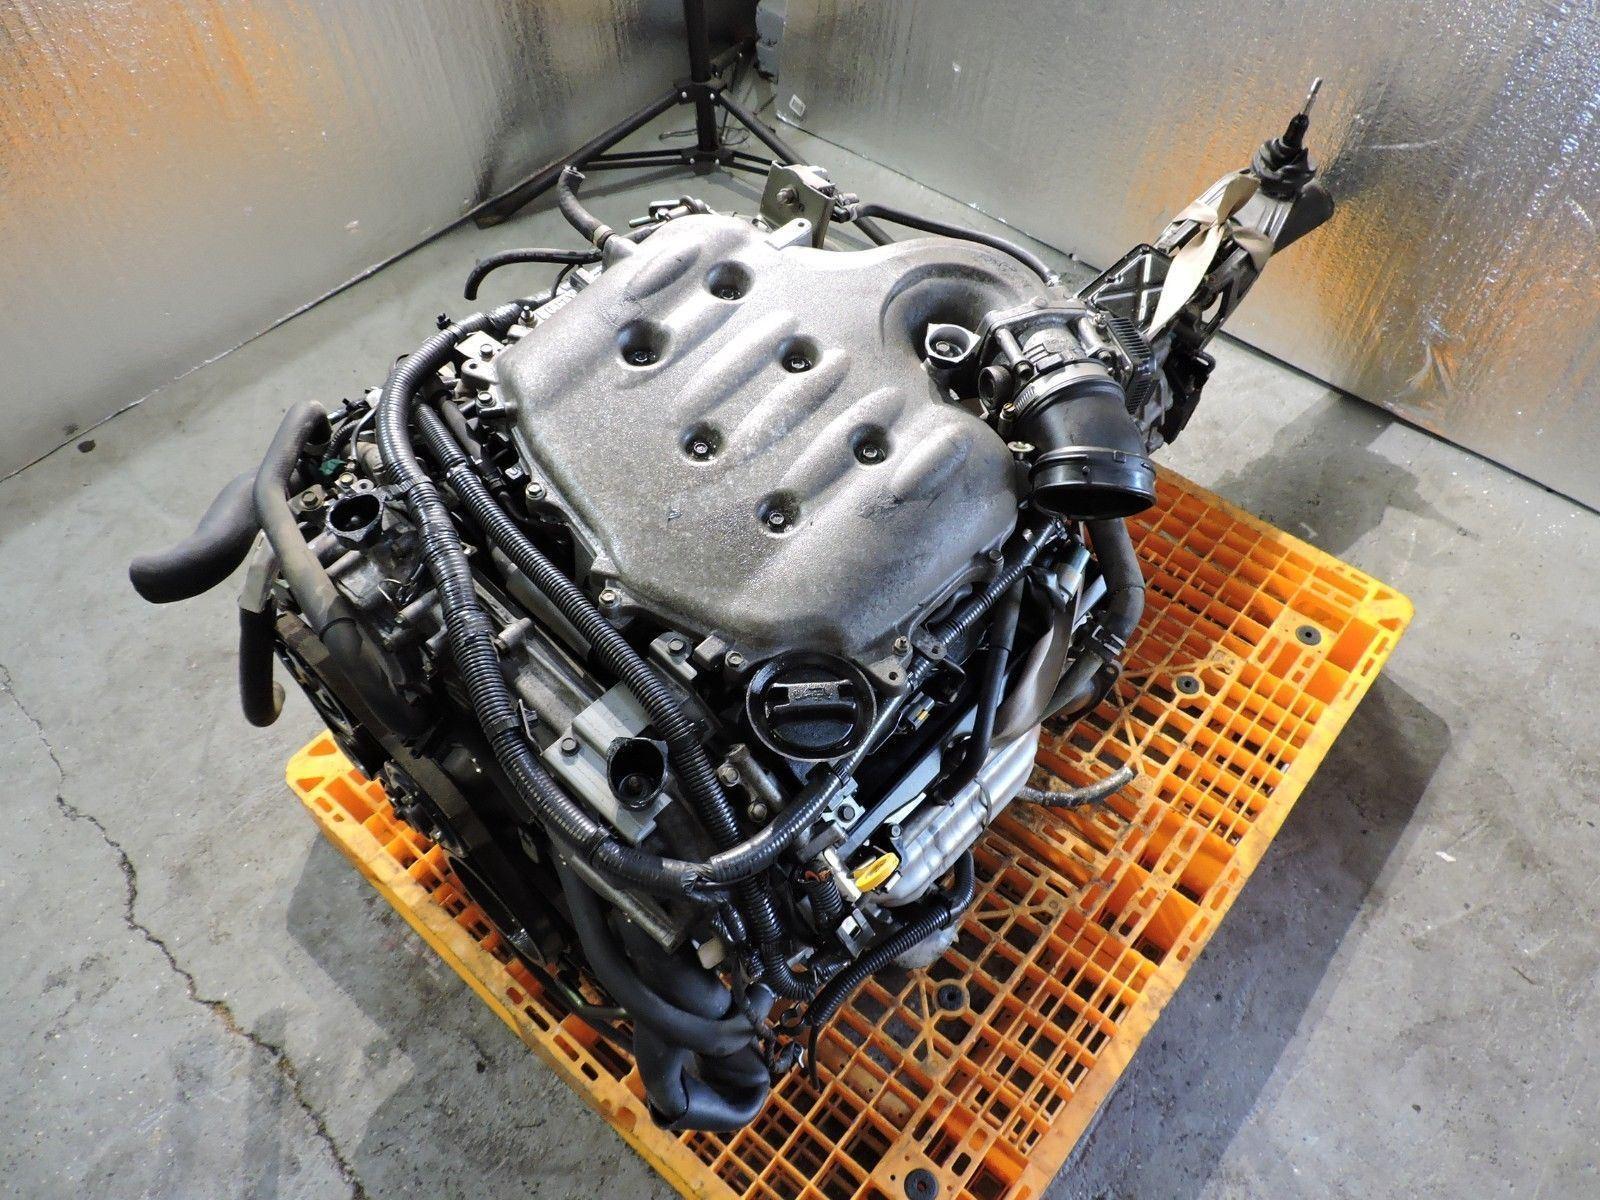 Details about Nissan 350Z Infiniti G35 3 5L VQ35DE 6 Speed Manual JDM Swap  w FREE SHIPPING